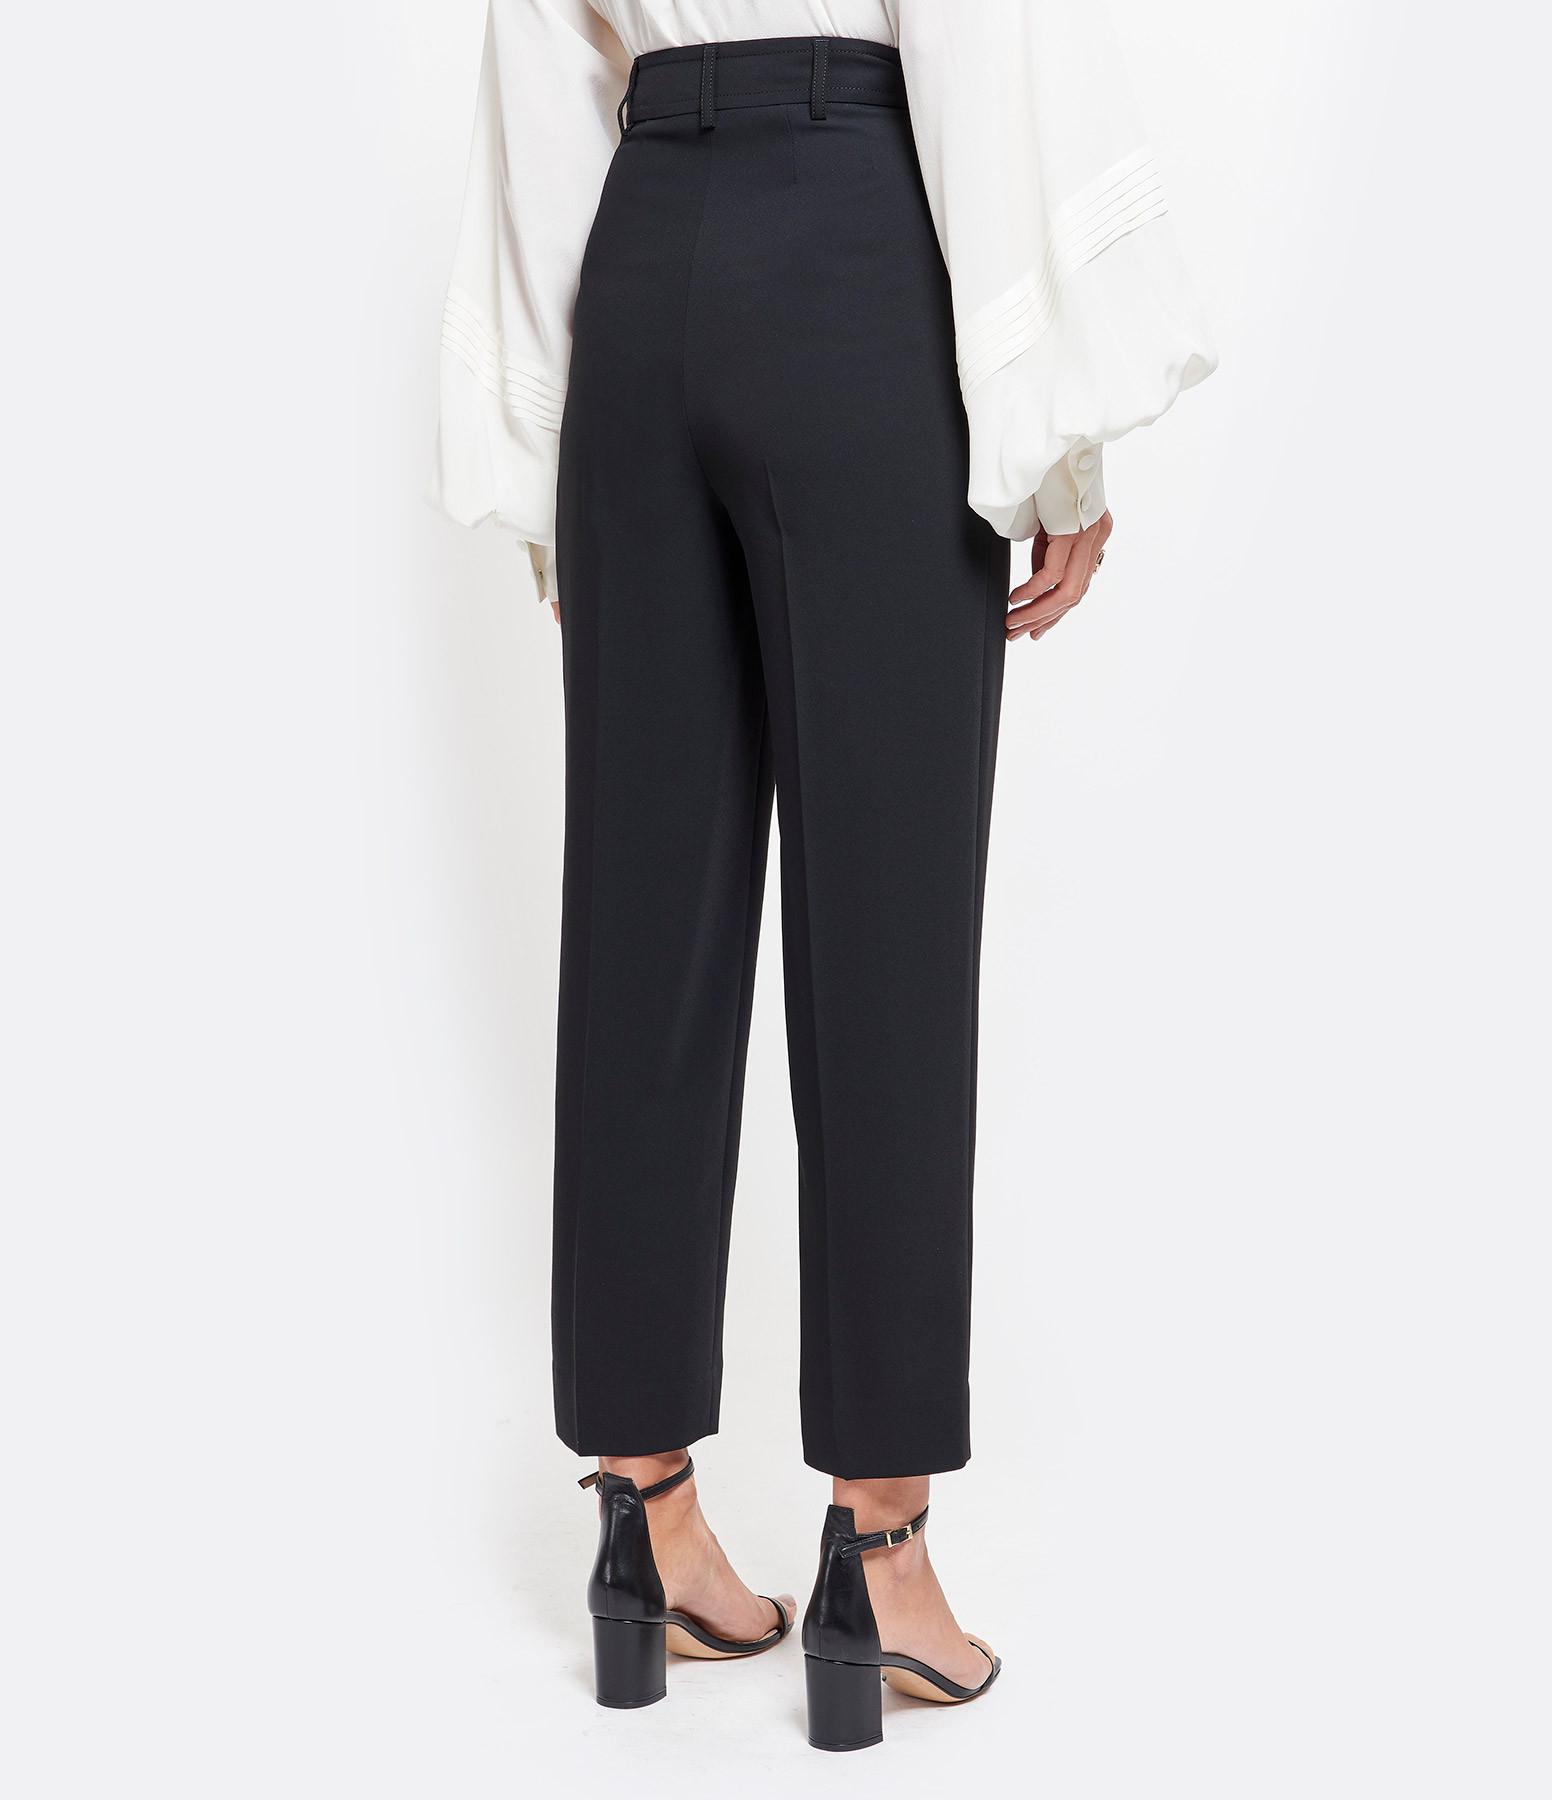 SEE BY CHLOE - Pantalon Coton Noir